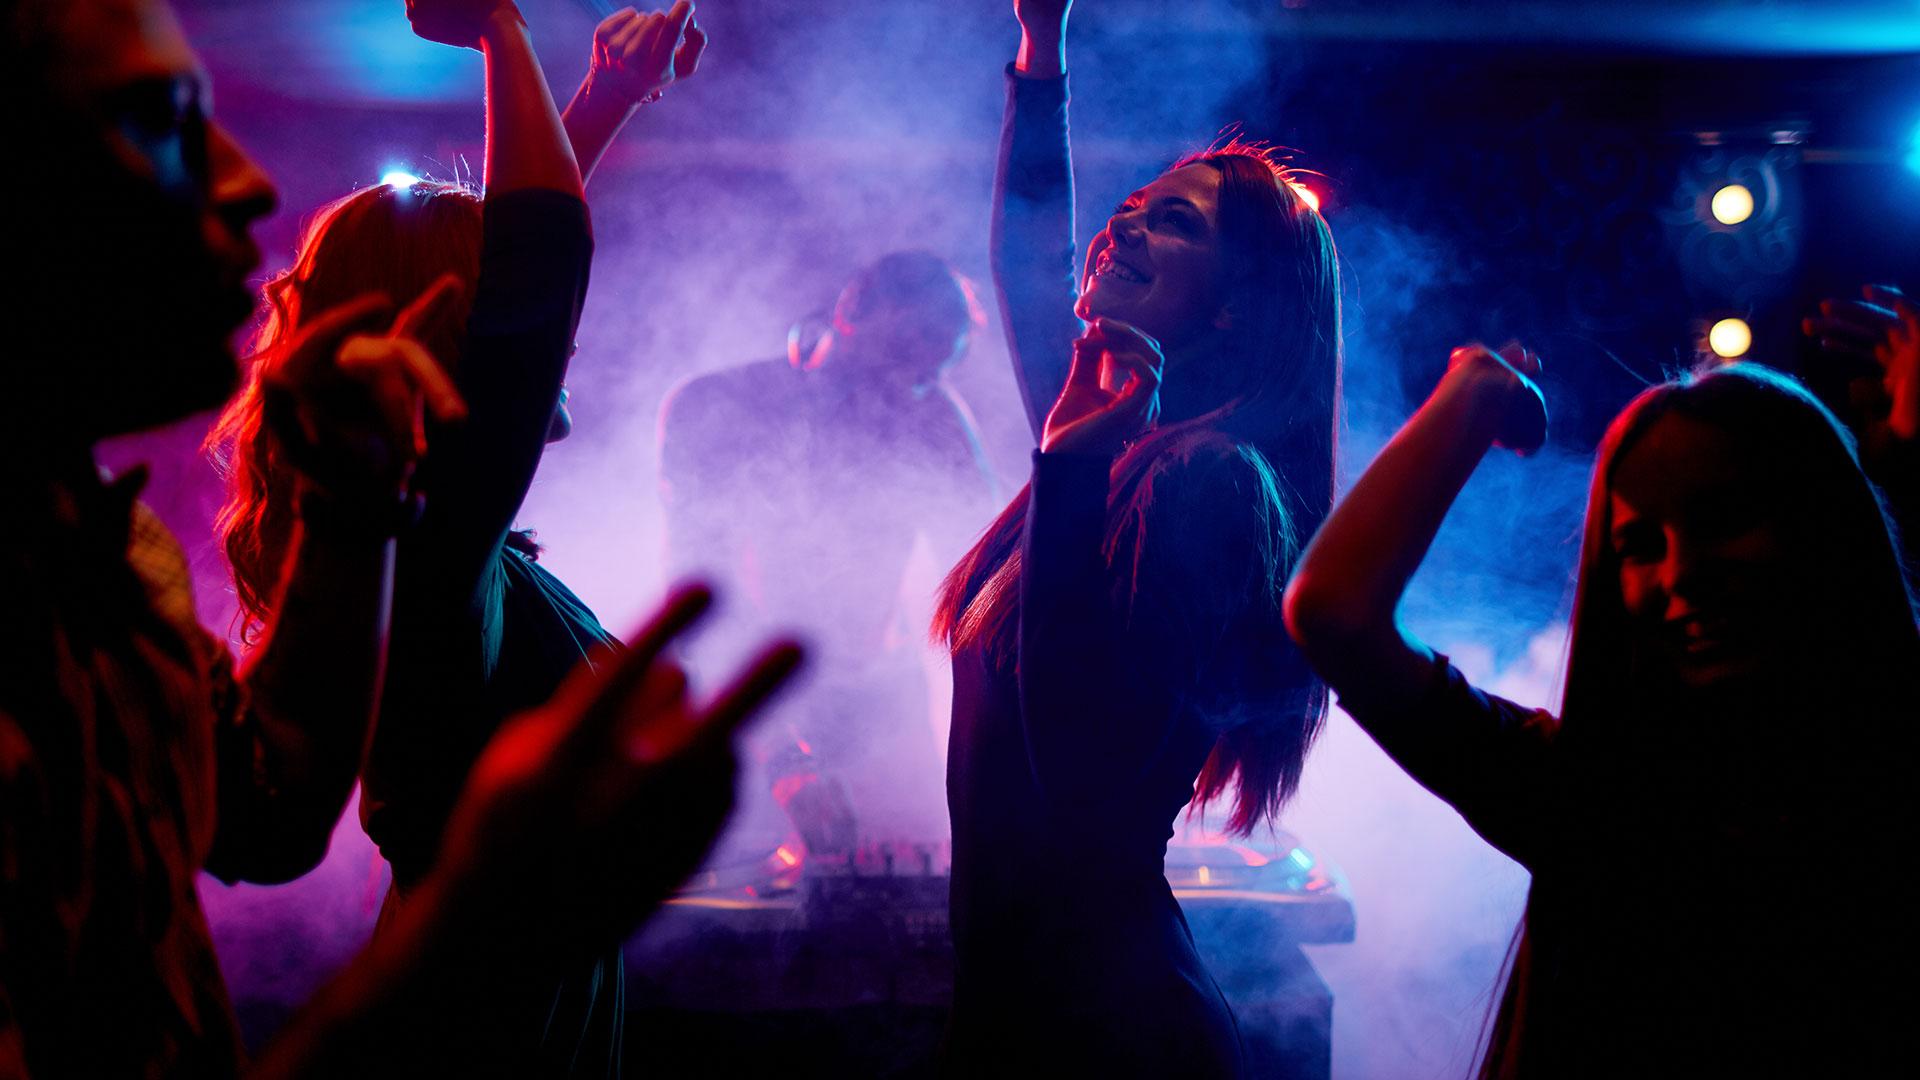 Nightclub dance clubs in bangalore dating 2